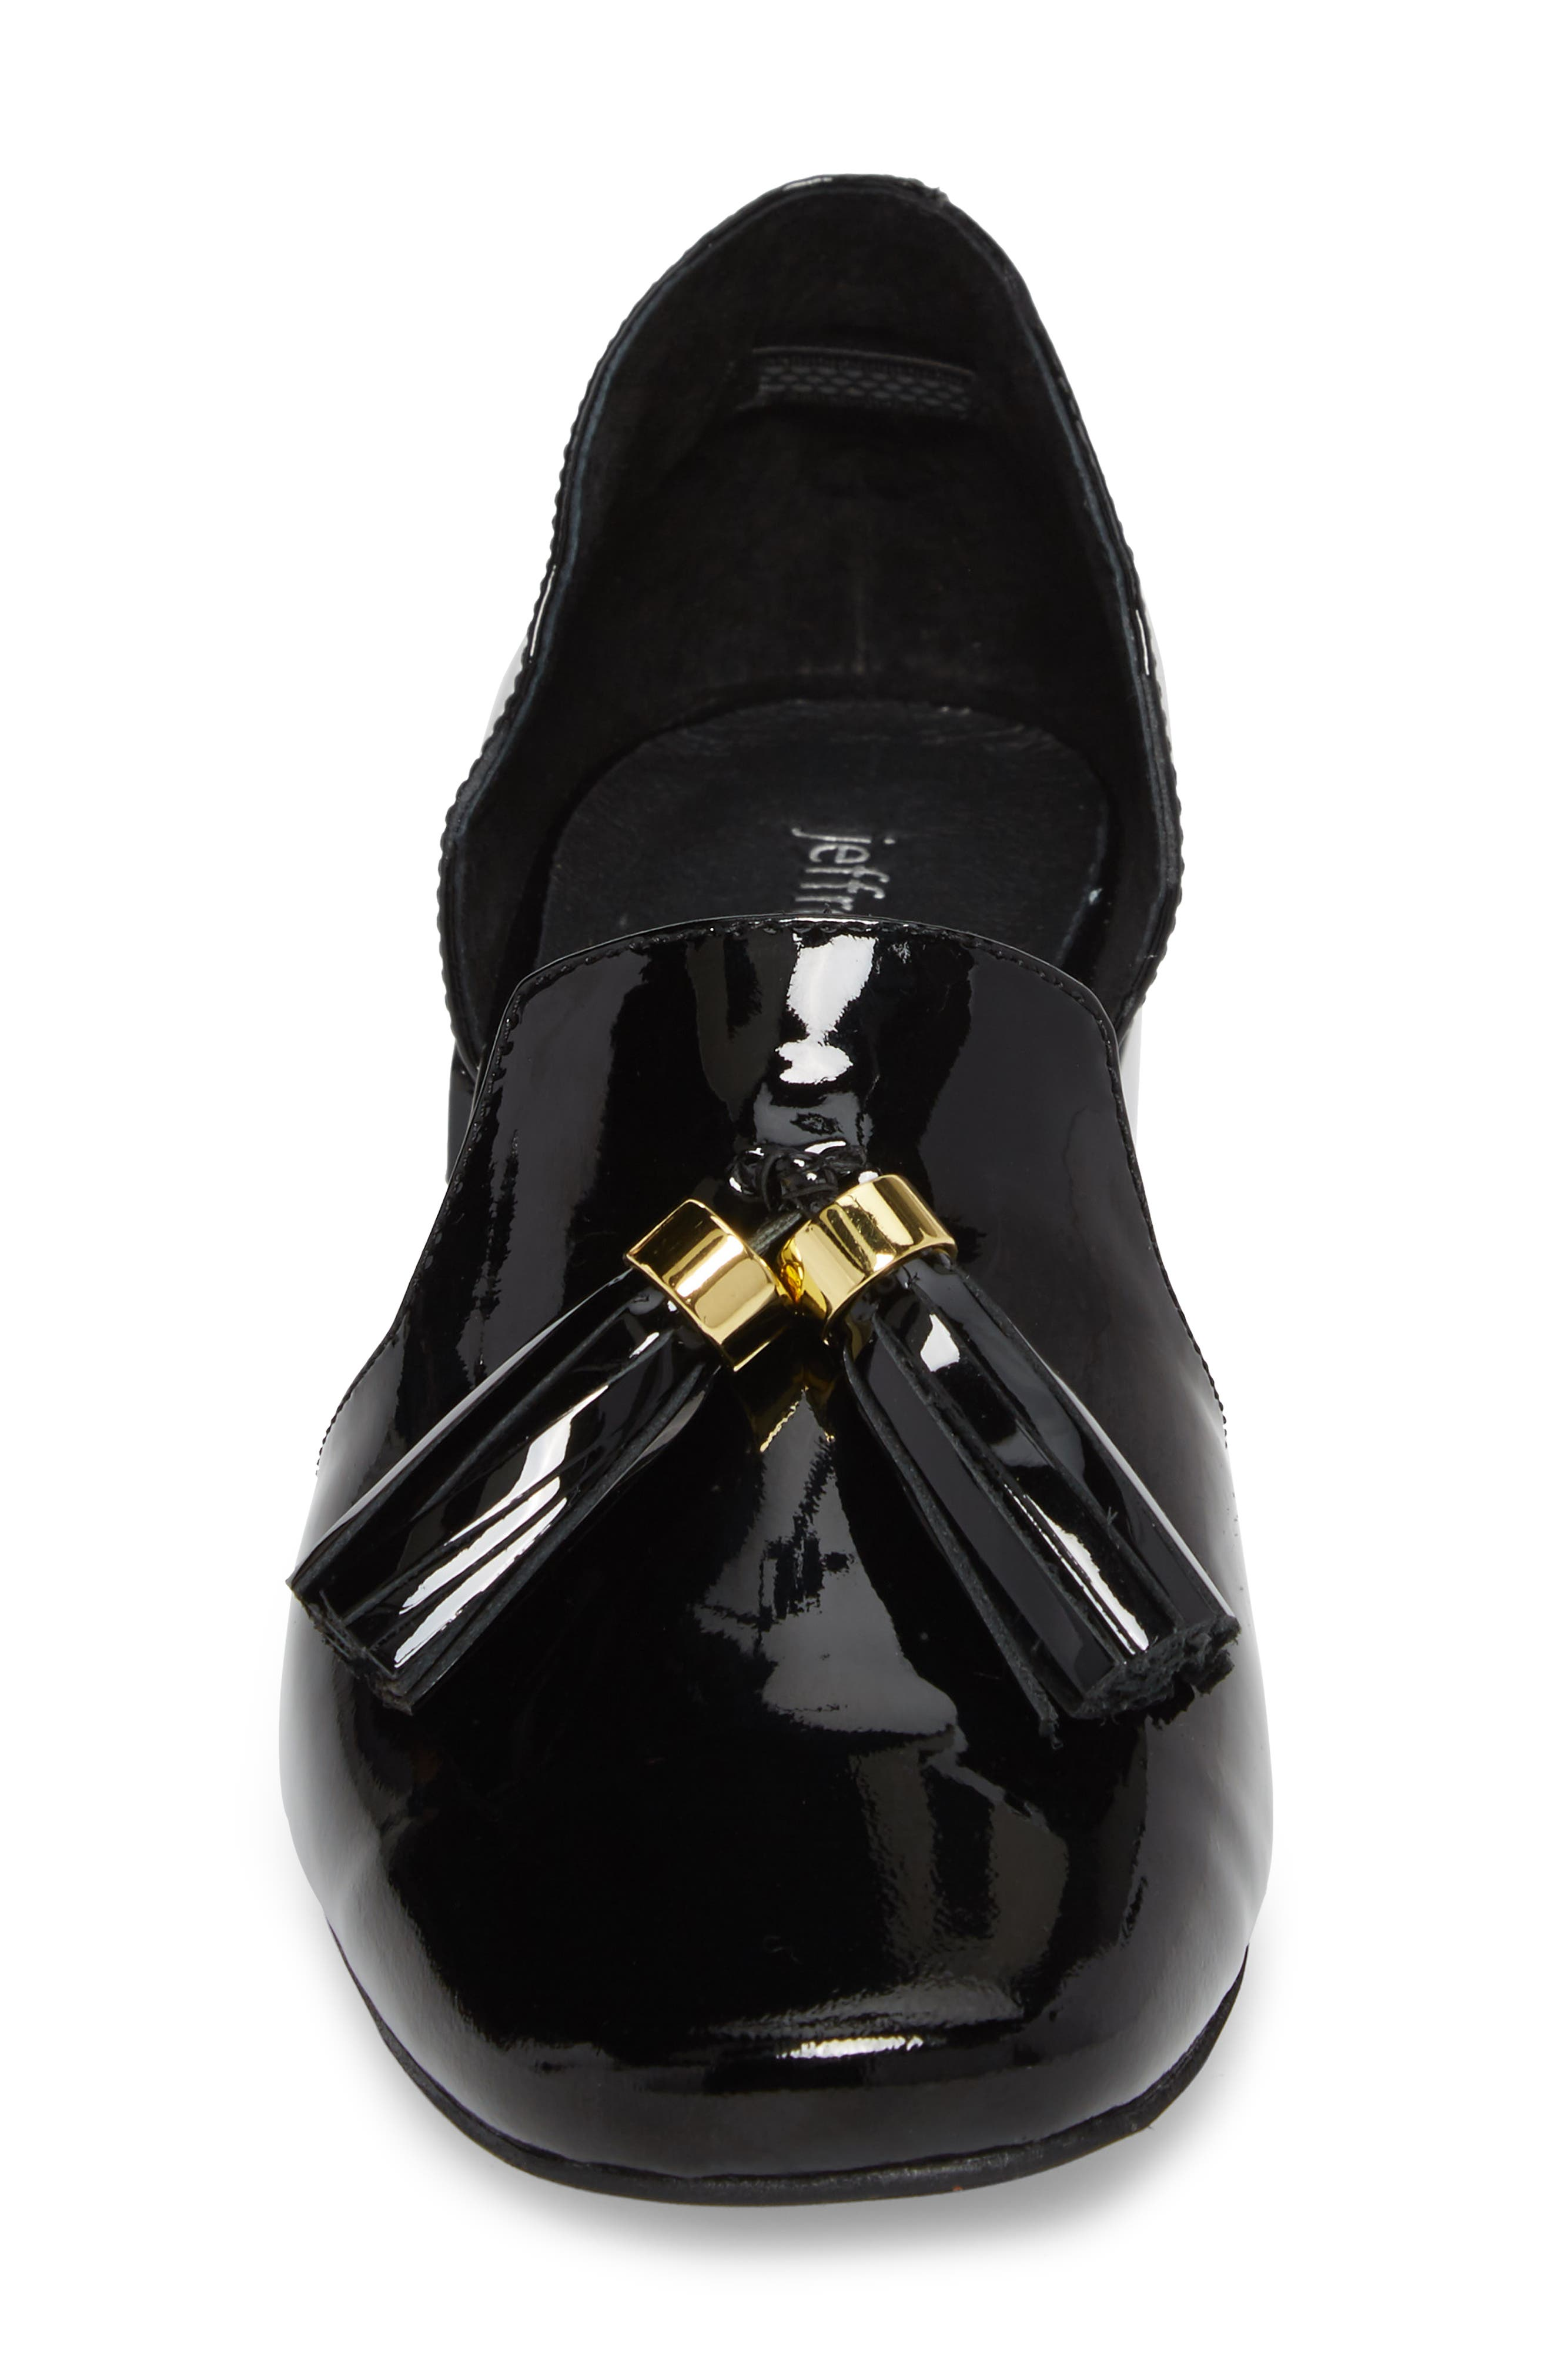 Genial Statement Heel d'Orsay Pump,                             Alternate thumbnail 4, color,                             Black Patent Leather